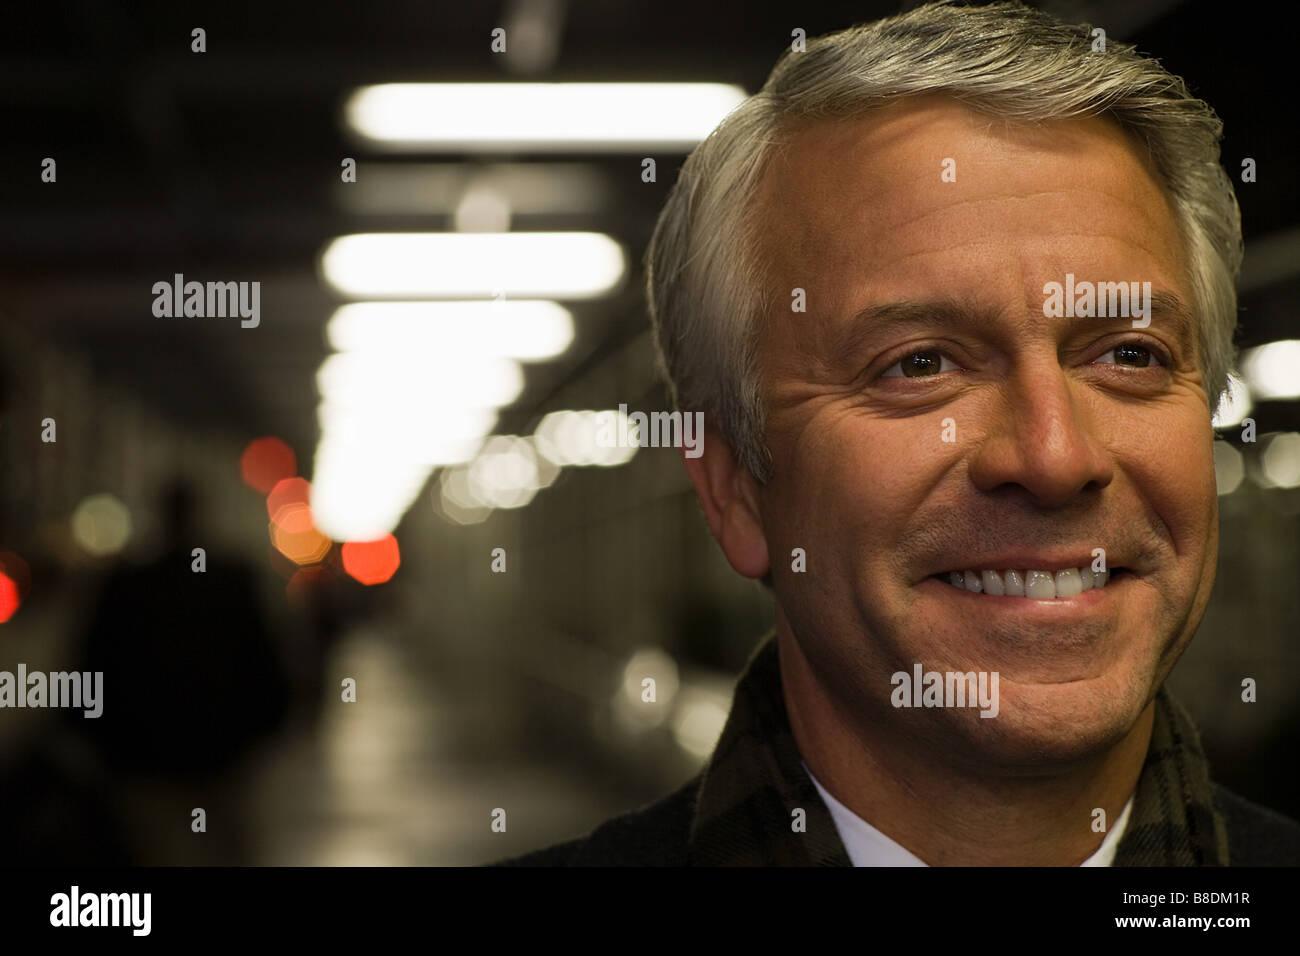 Headshot of a smiling mature man - Stock Image